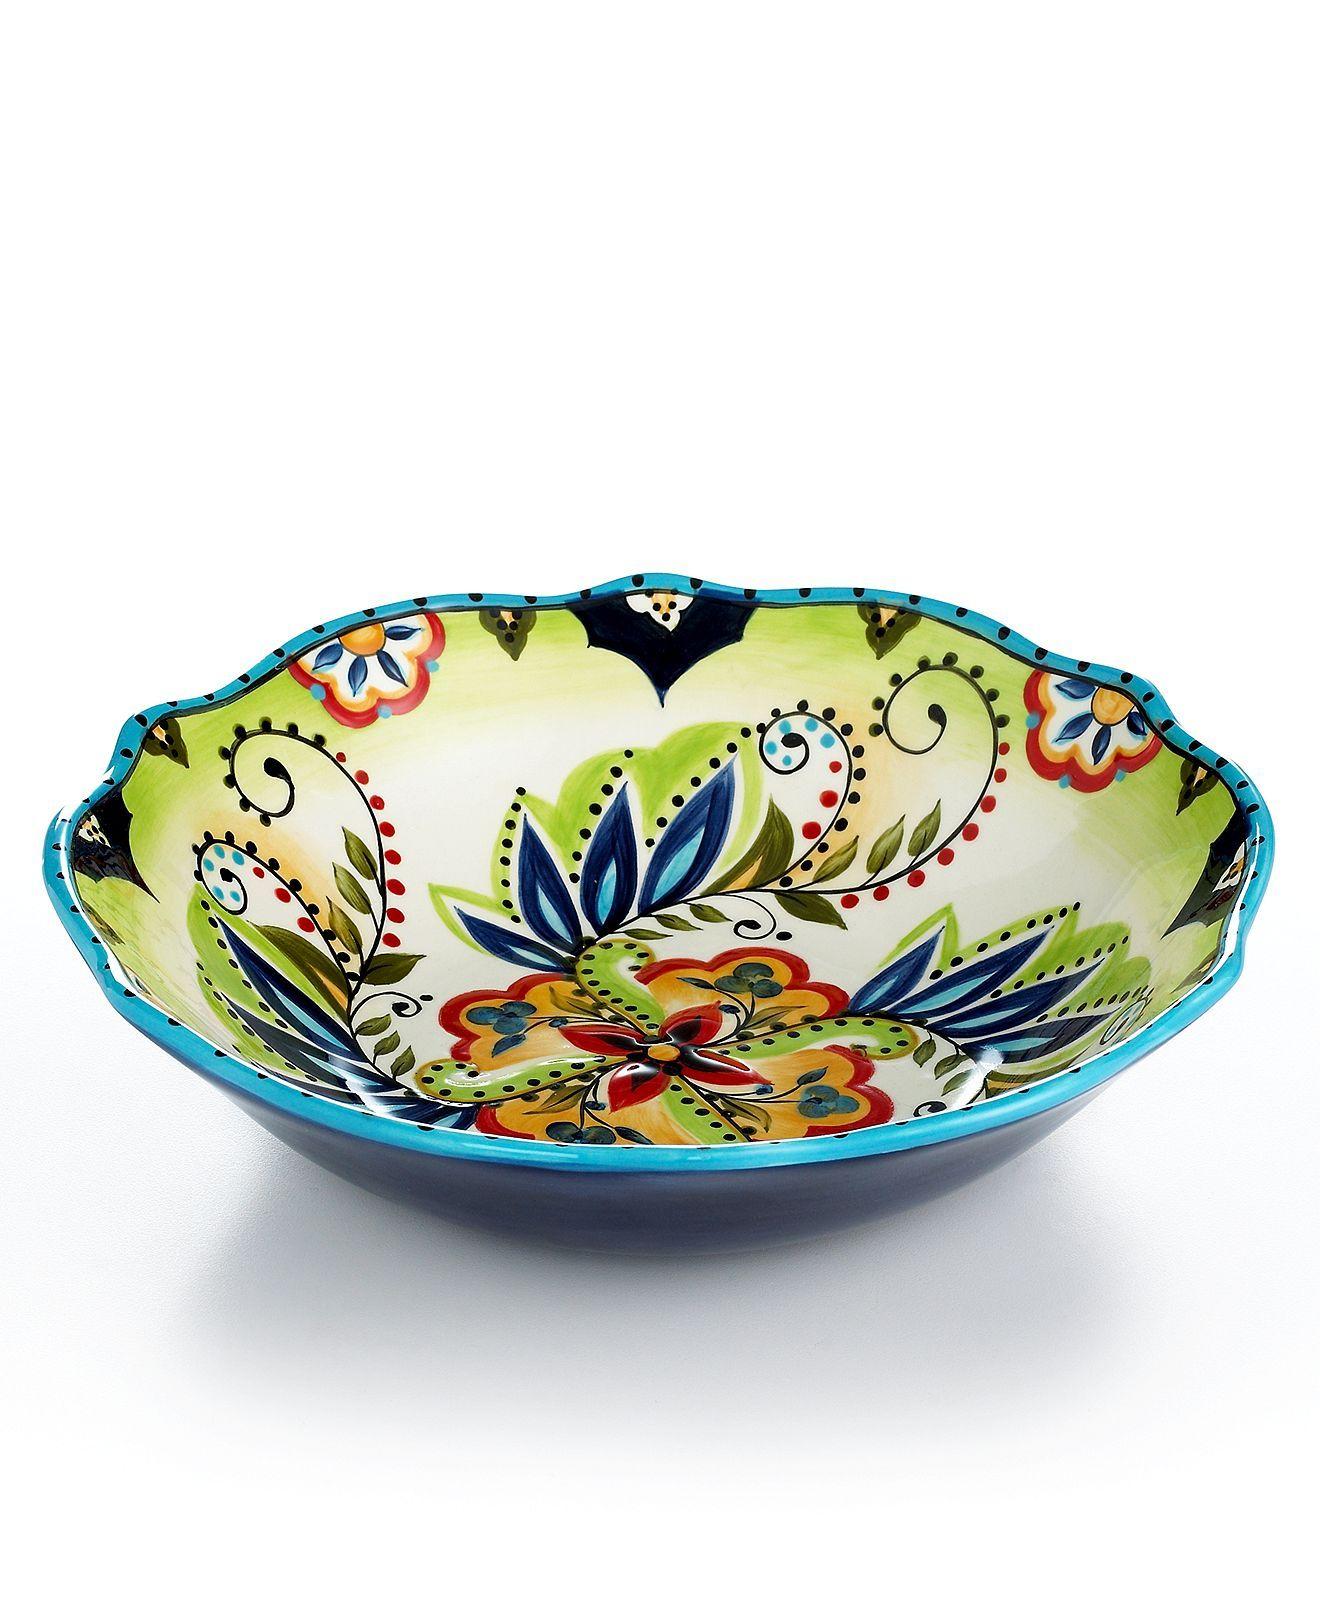 Espana Dinnerware Bocca Scalloped Serving Bowl - Serveware - Dining u0026 Entertaining - Macys  sc 1 st  Pinterest & Espana Dinnerware Bocca Scalloped Serving Bowl - Serveware - Dining ...